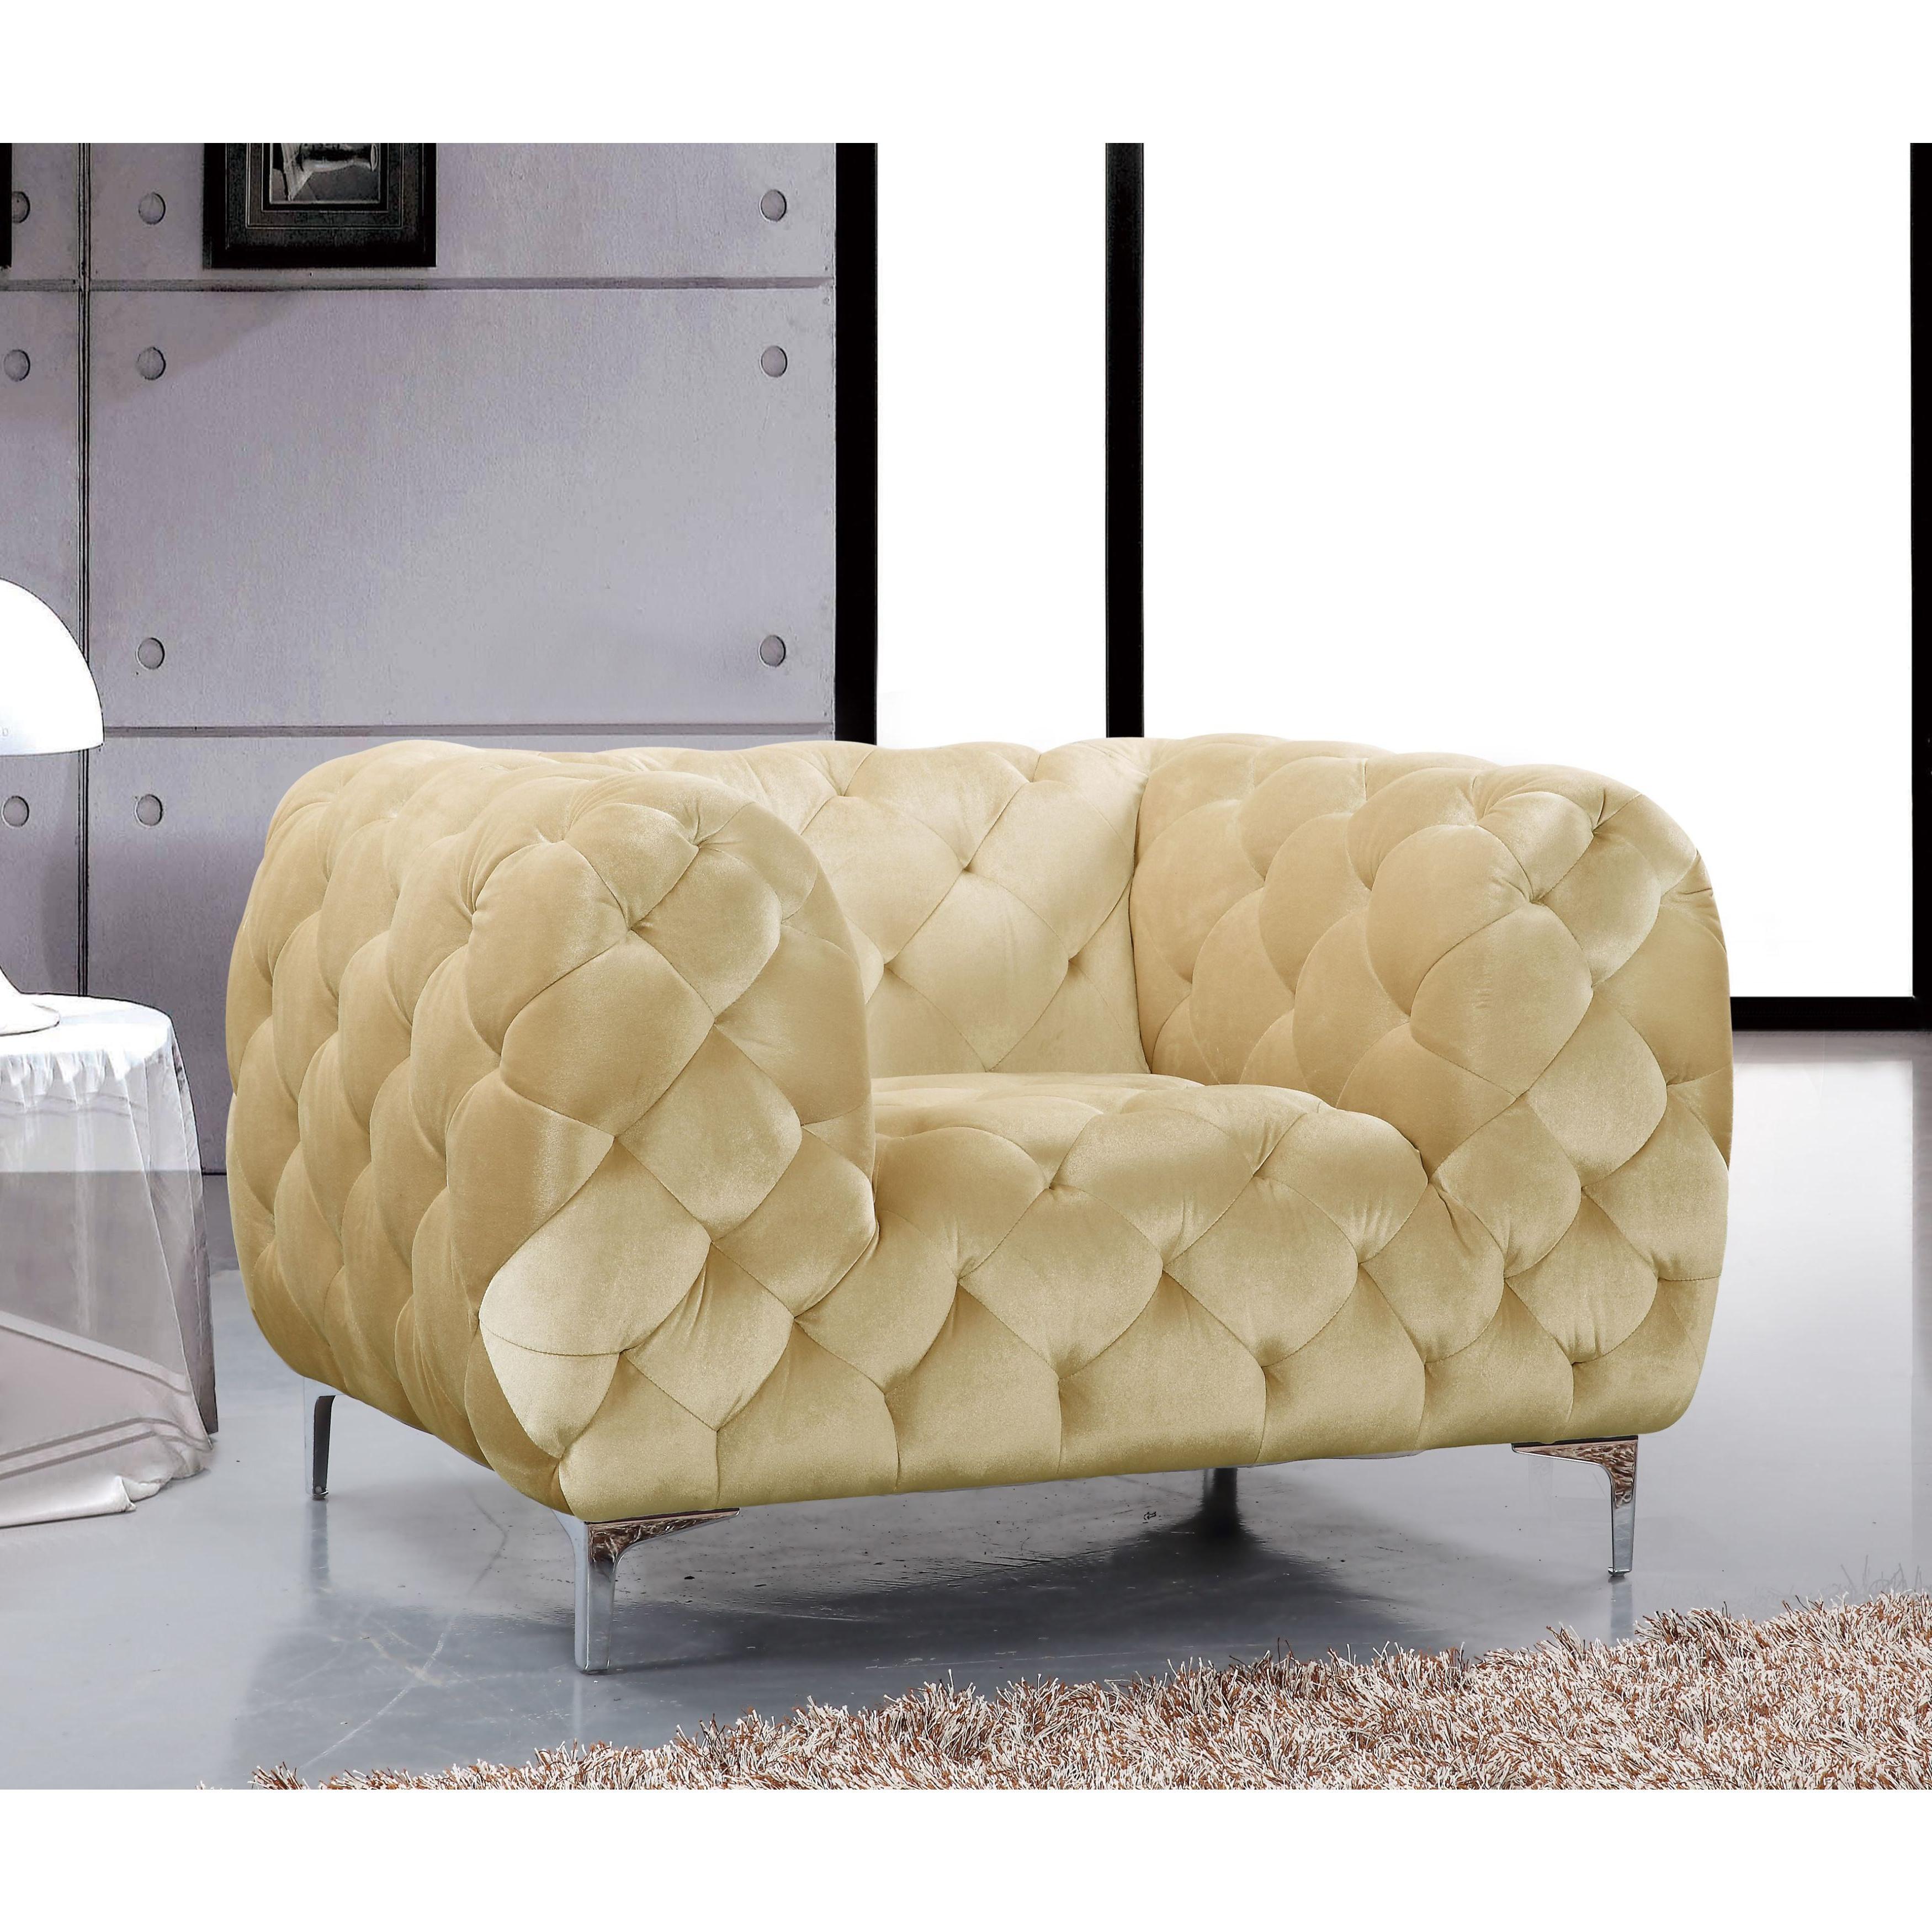 Shop Meridian Mercer Beige Velvet Tufted Chair – Free Shipping Today Inside Popular Mercer Foam Swivel Chairs (View 20 of 20)